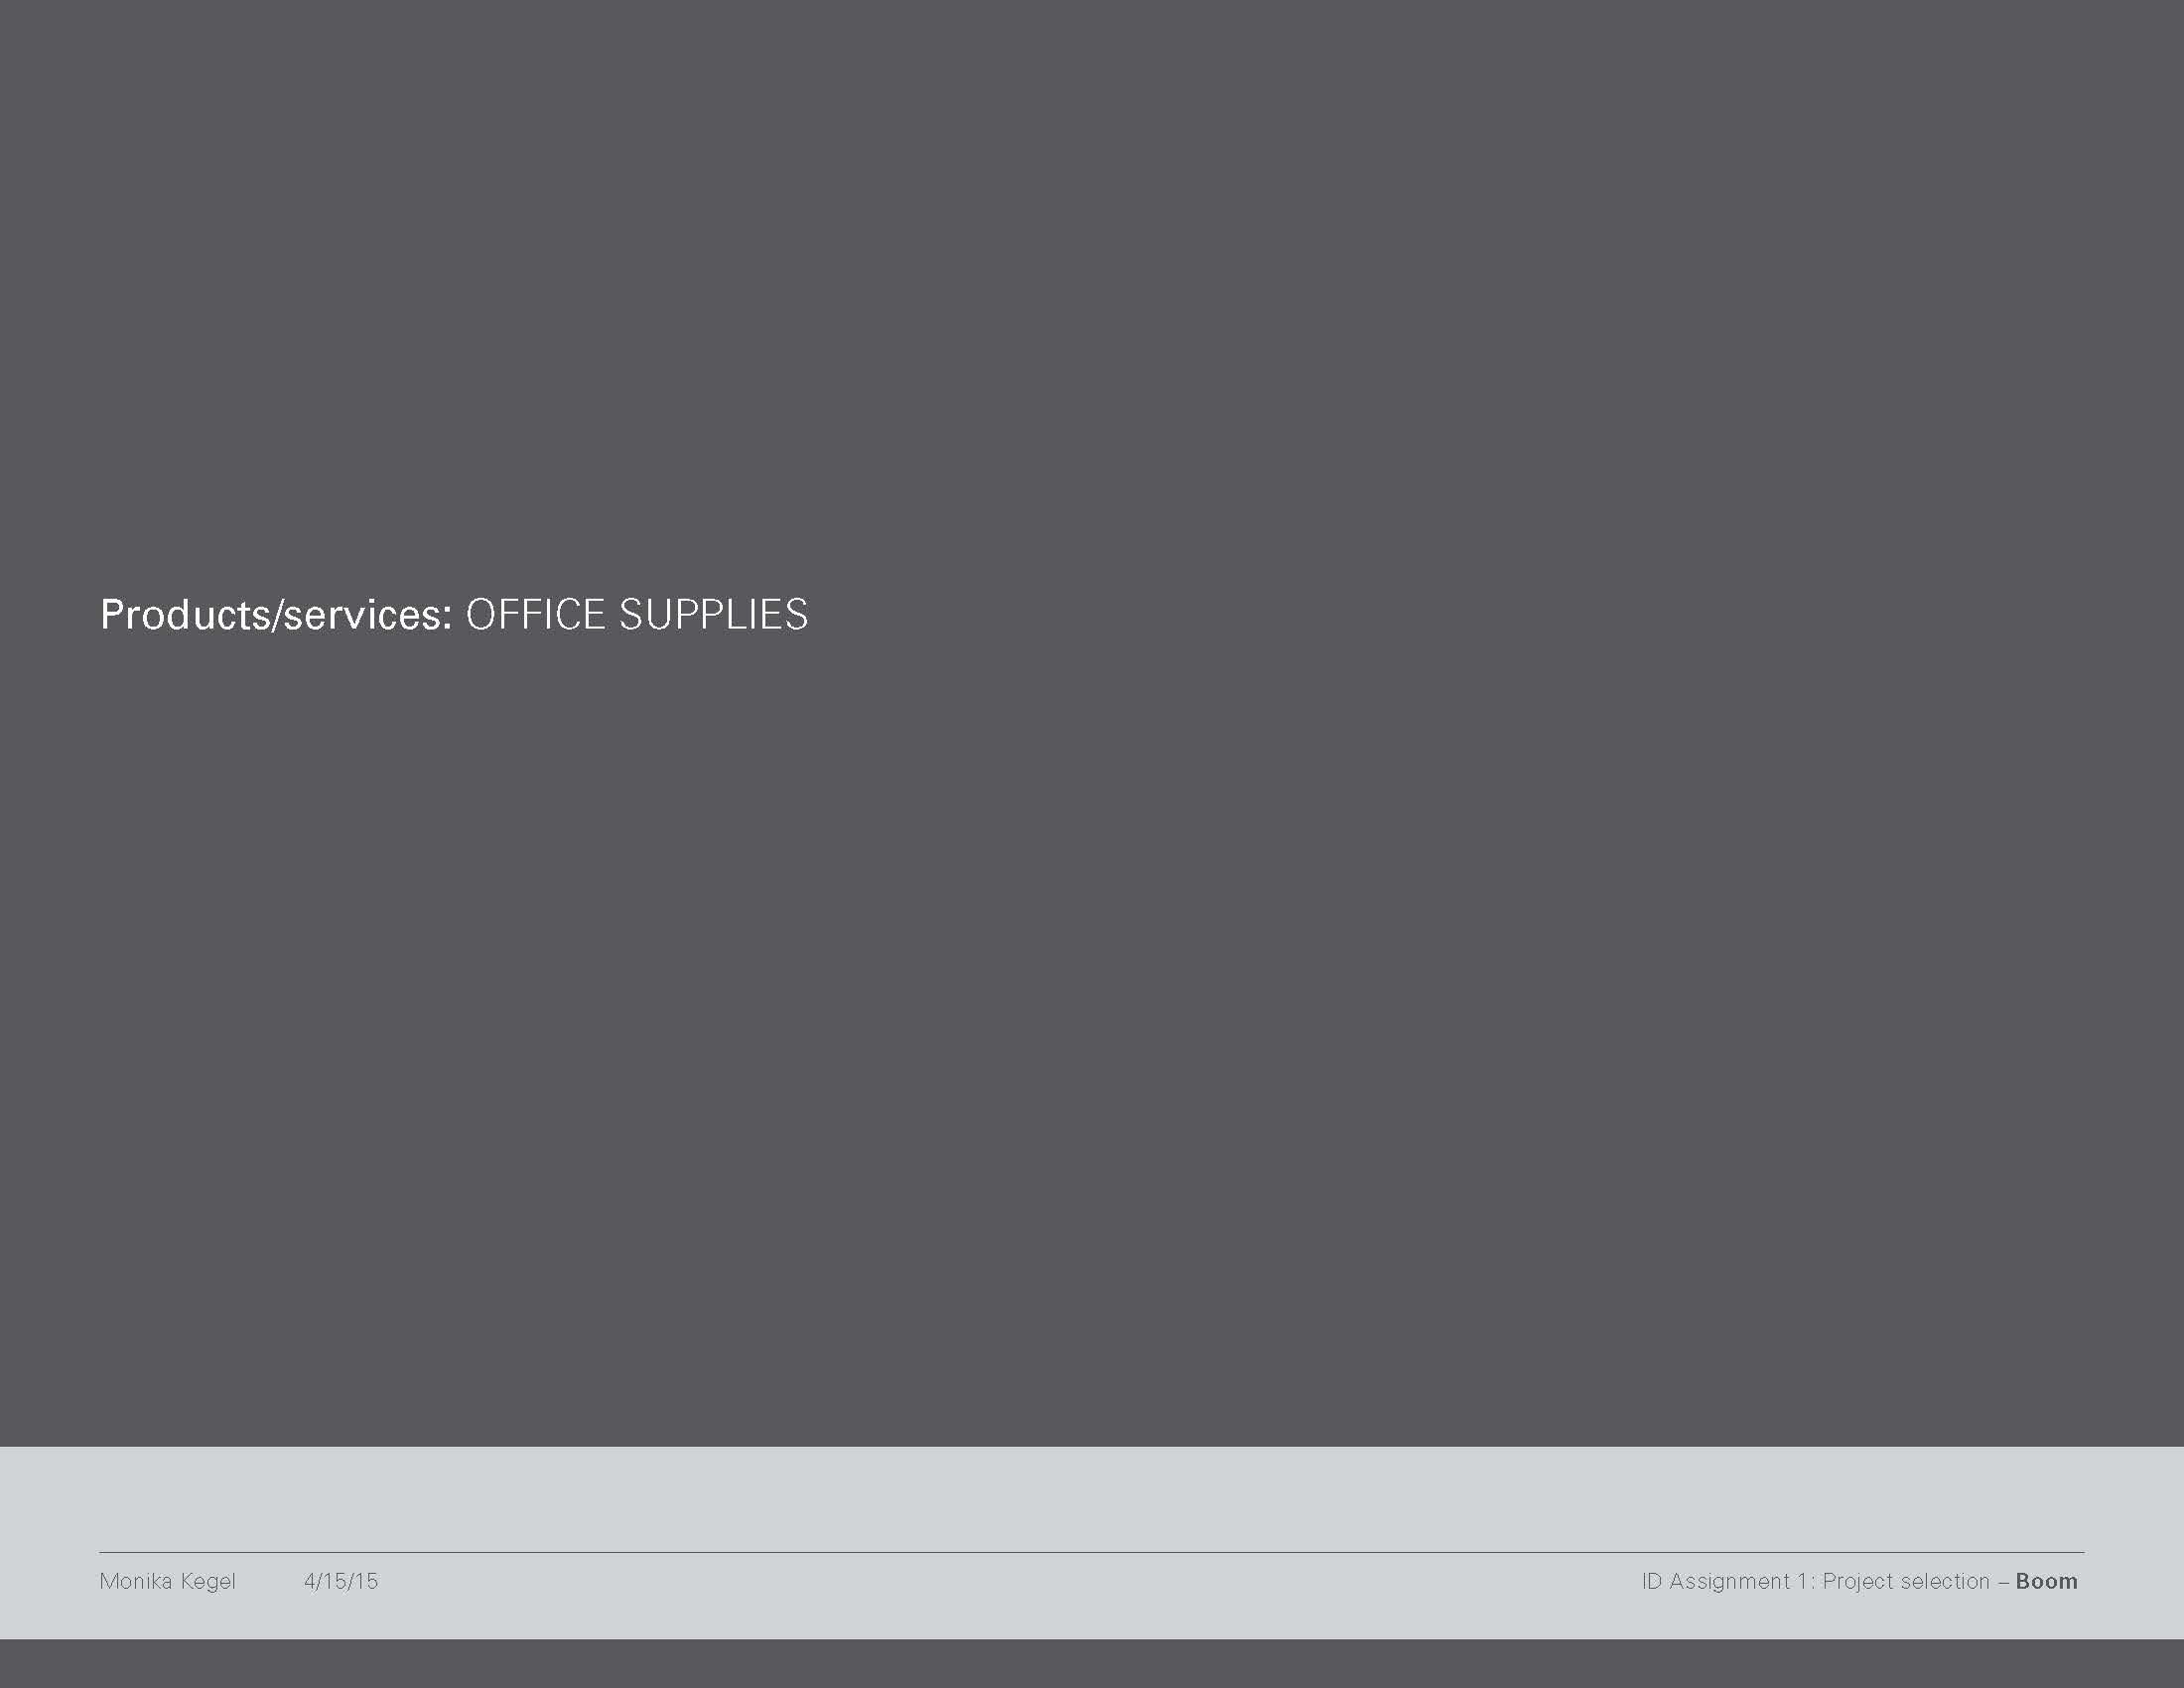 Kegel_Assignment1_ID_Page_03.jpg